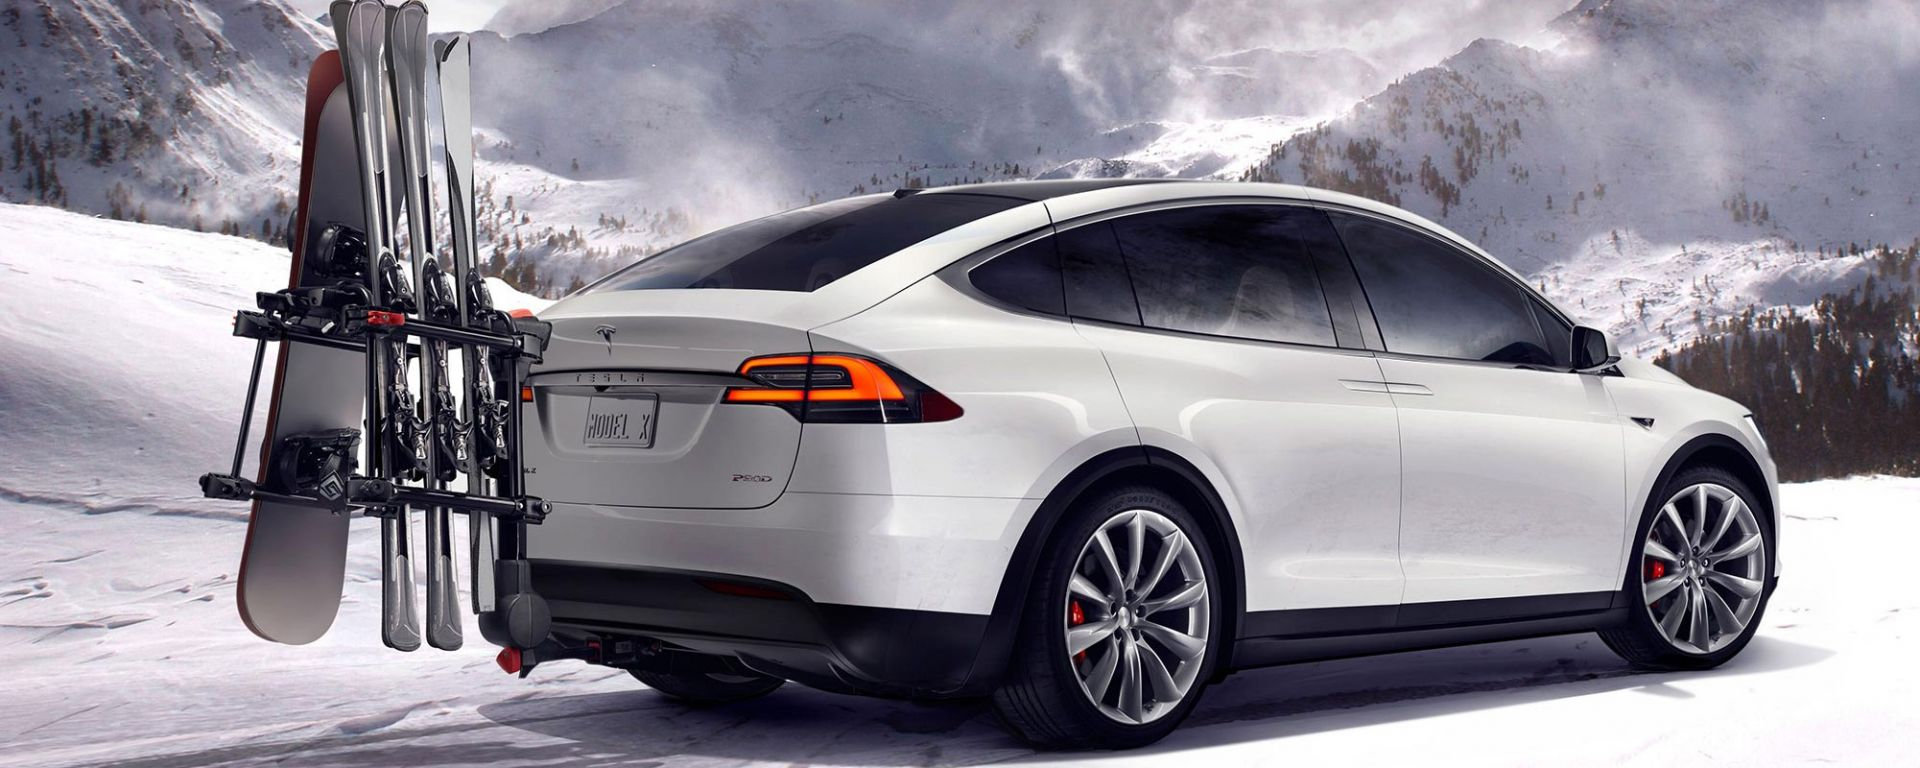 Pirelli: uno Scorpion Zero Asimmetrico per la Tesla Model X